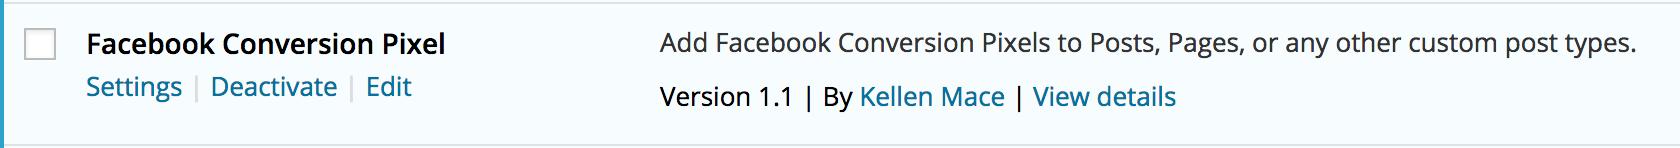 facebook-conversion-pixel-wordpress-plugin-settings